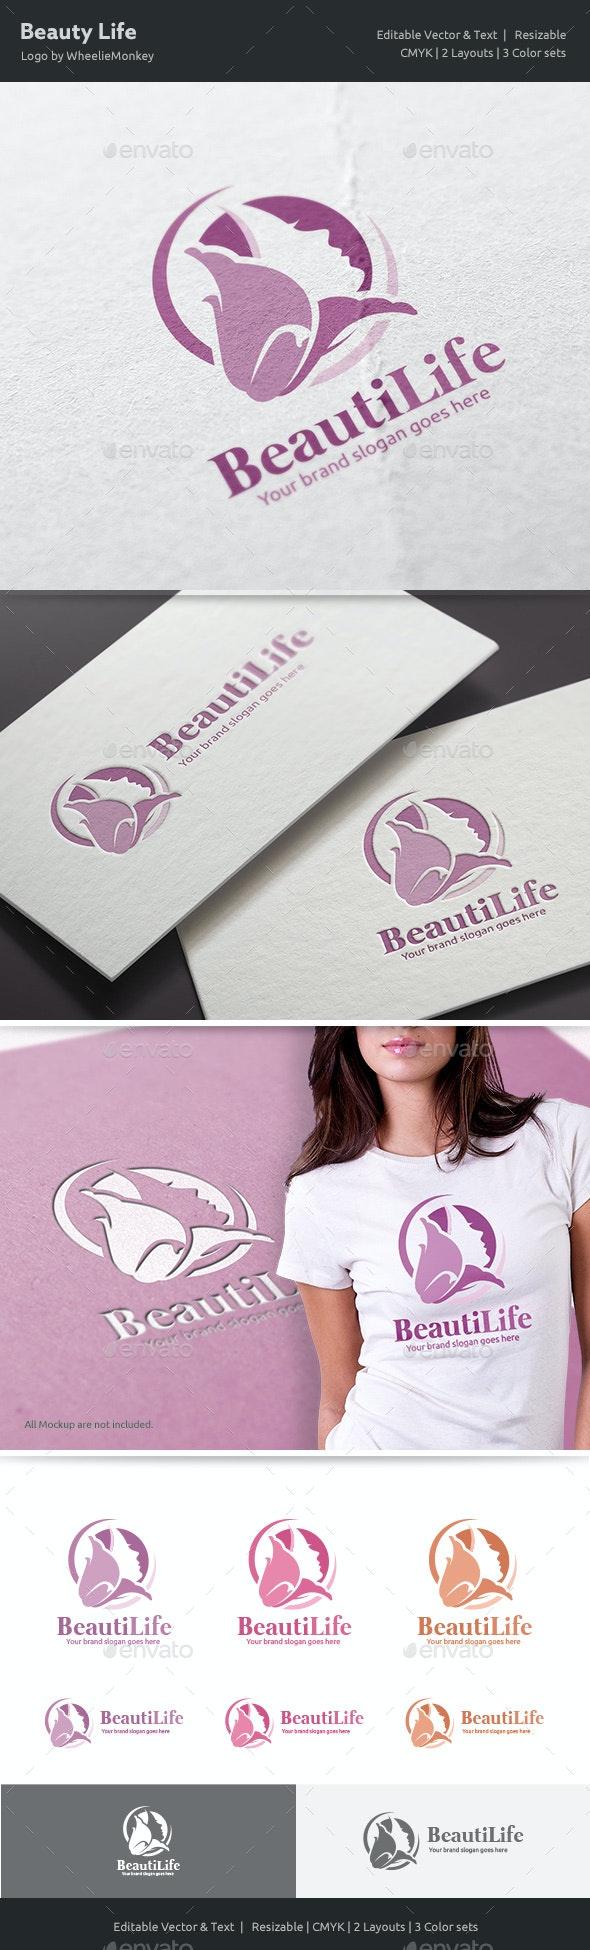 Beauty Life Logo - Vector Abstract